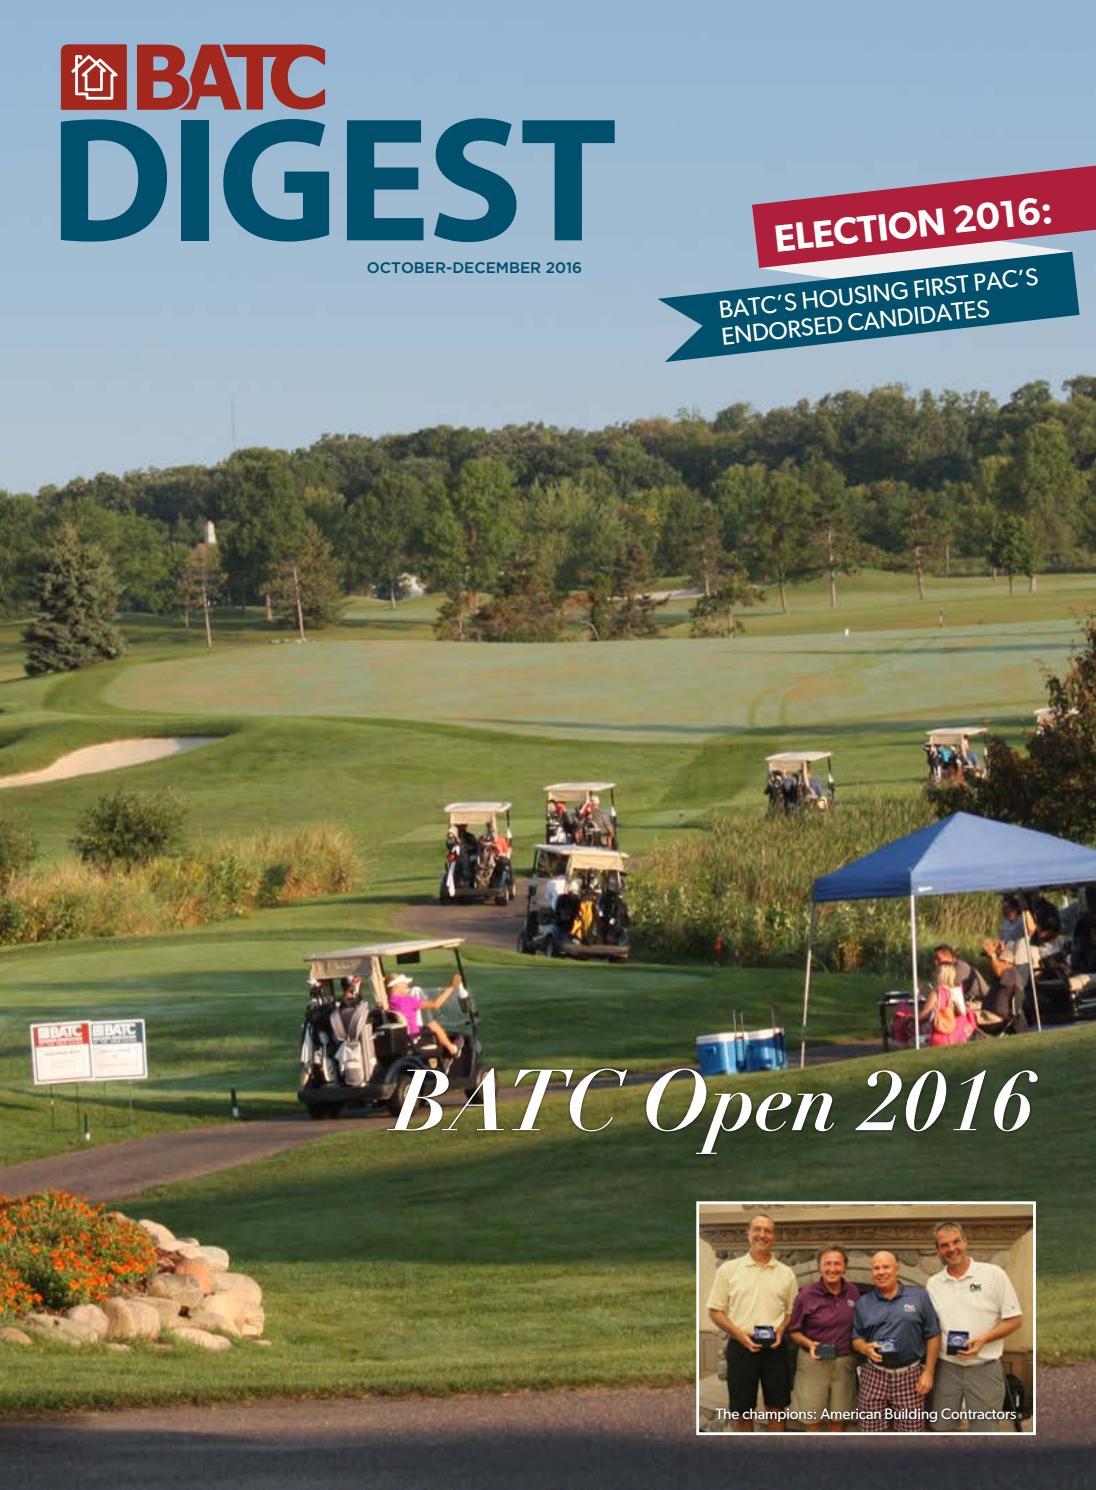 BATC Digest | Oct-Dec 2016 by BATC - issuu